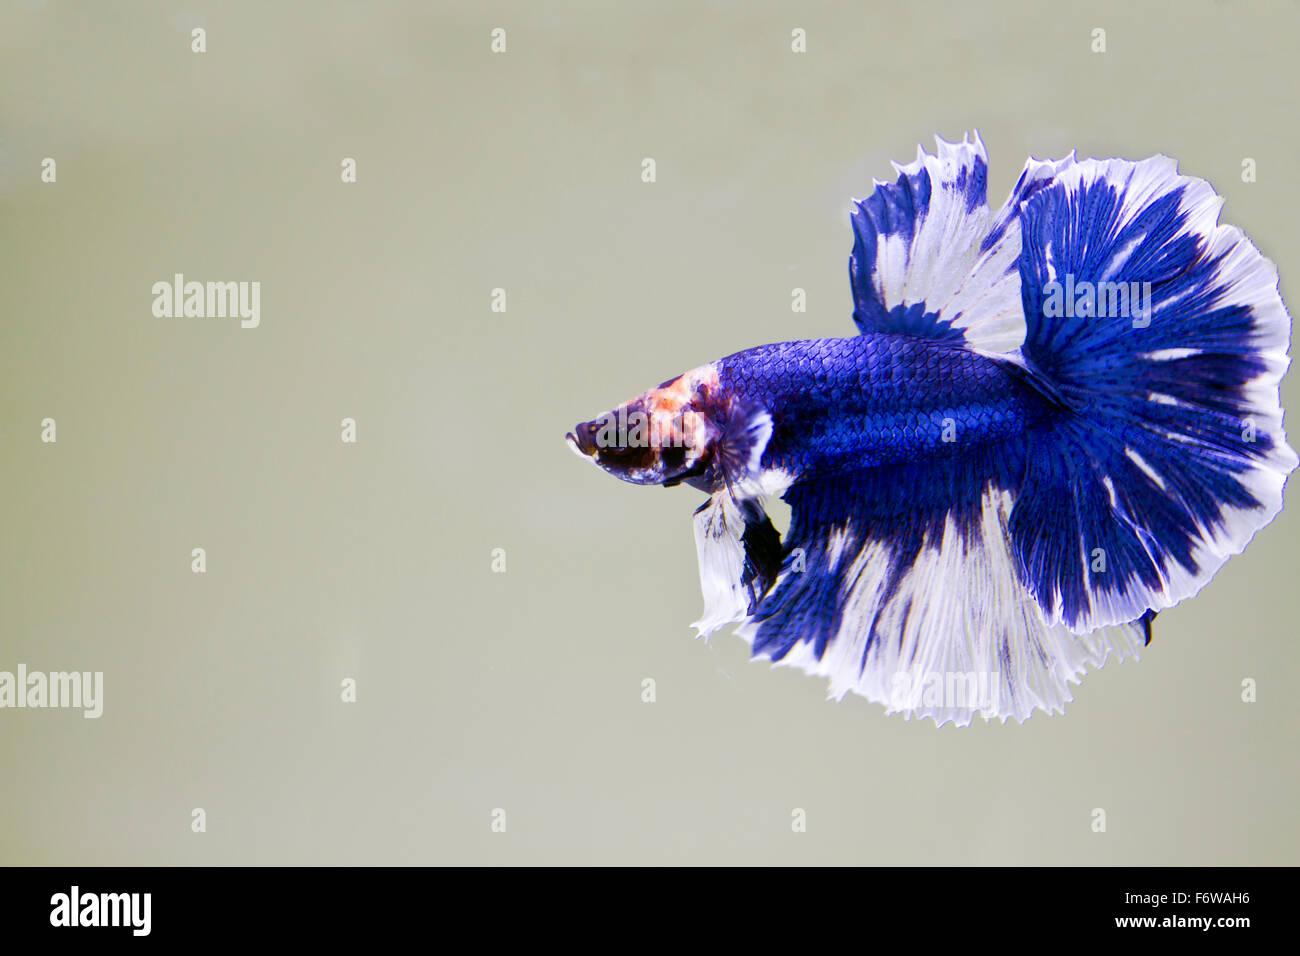 Betta fish, siamese fighting fish, betta splendens (Halfmoon betta ) swimming in the aquarium tank Stock Photo